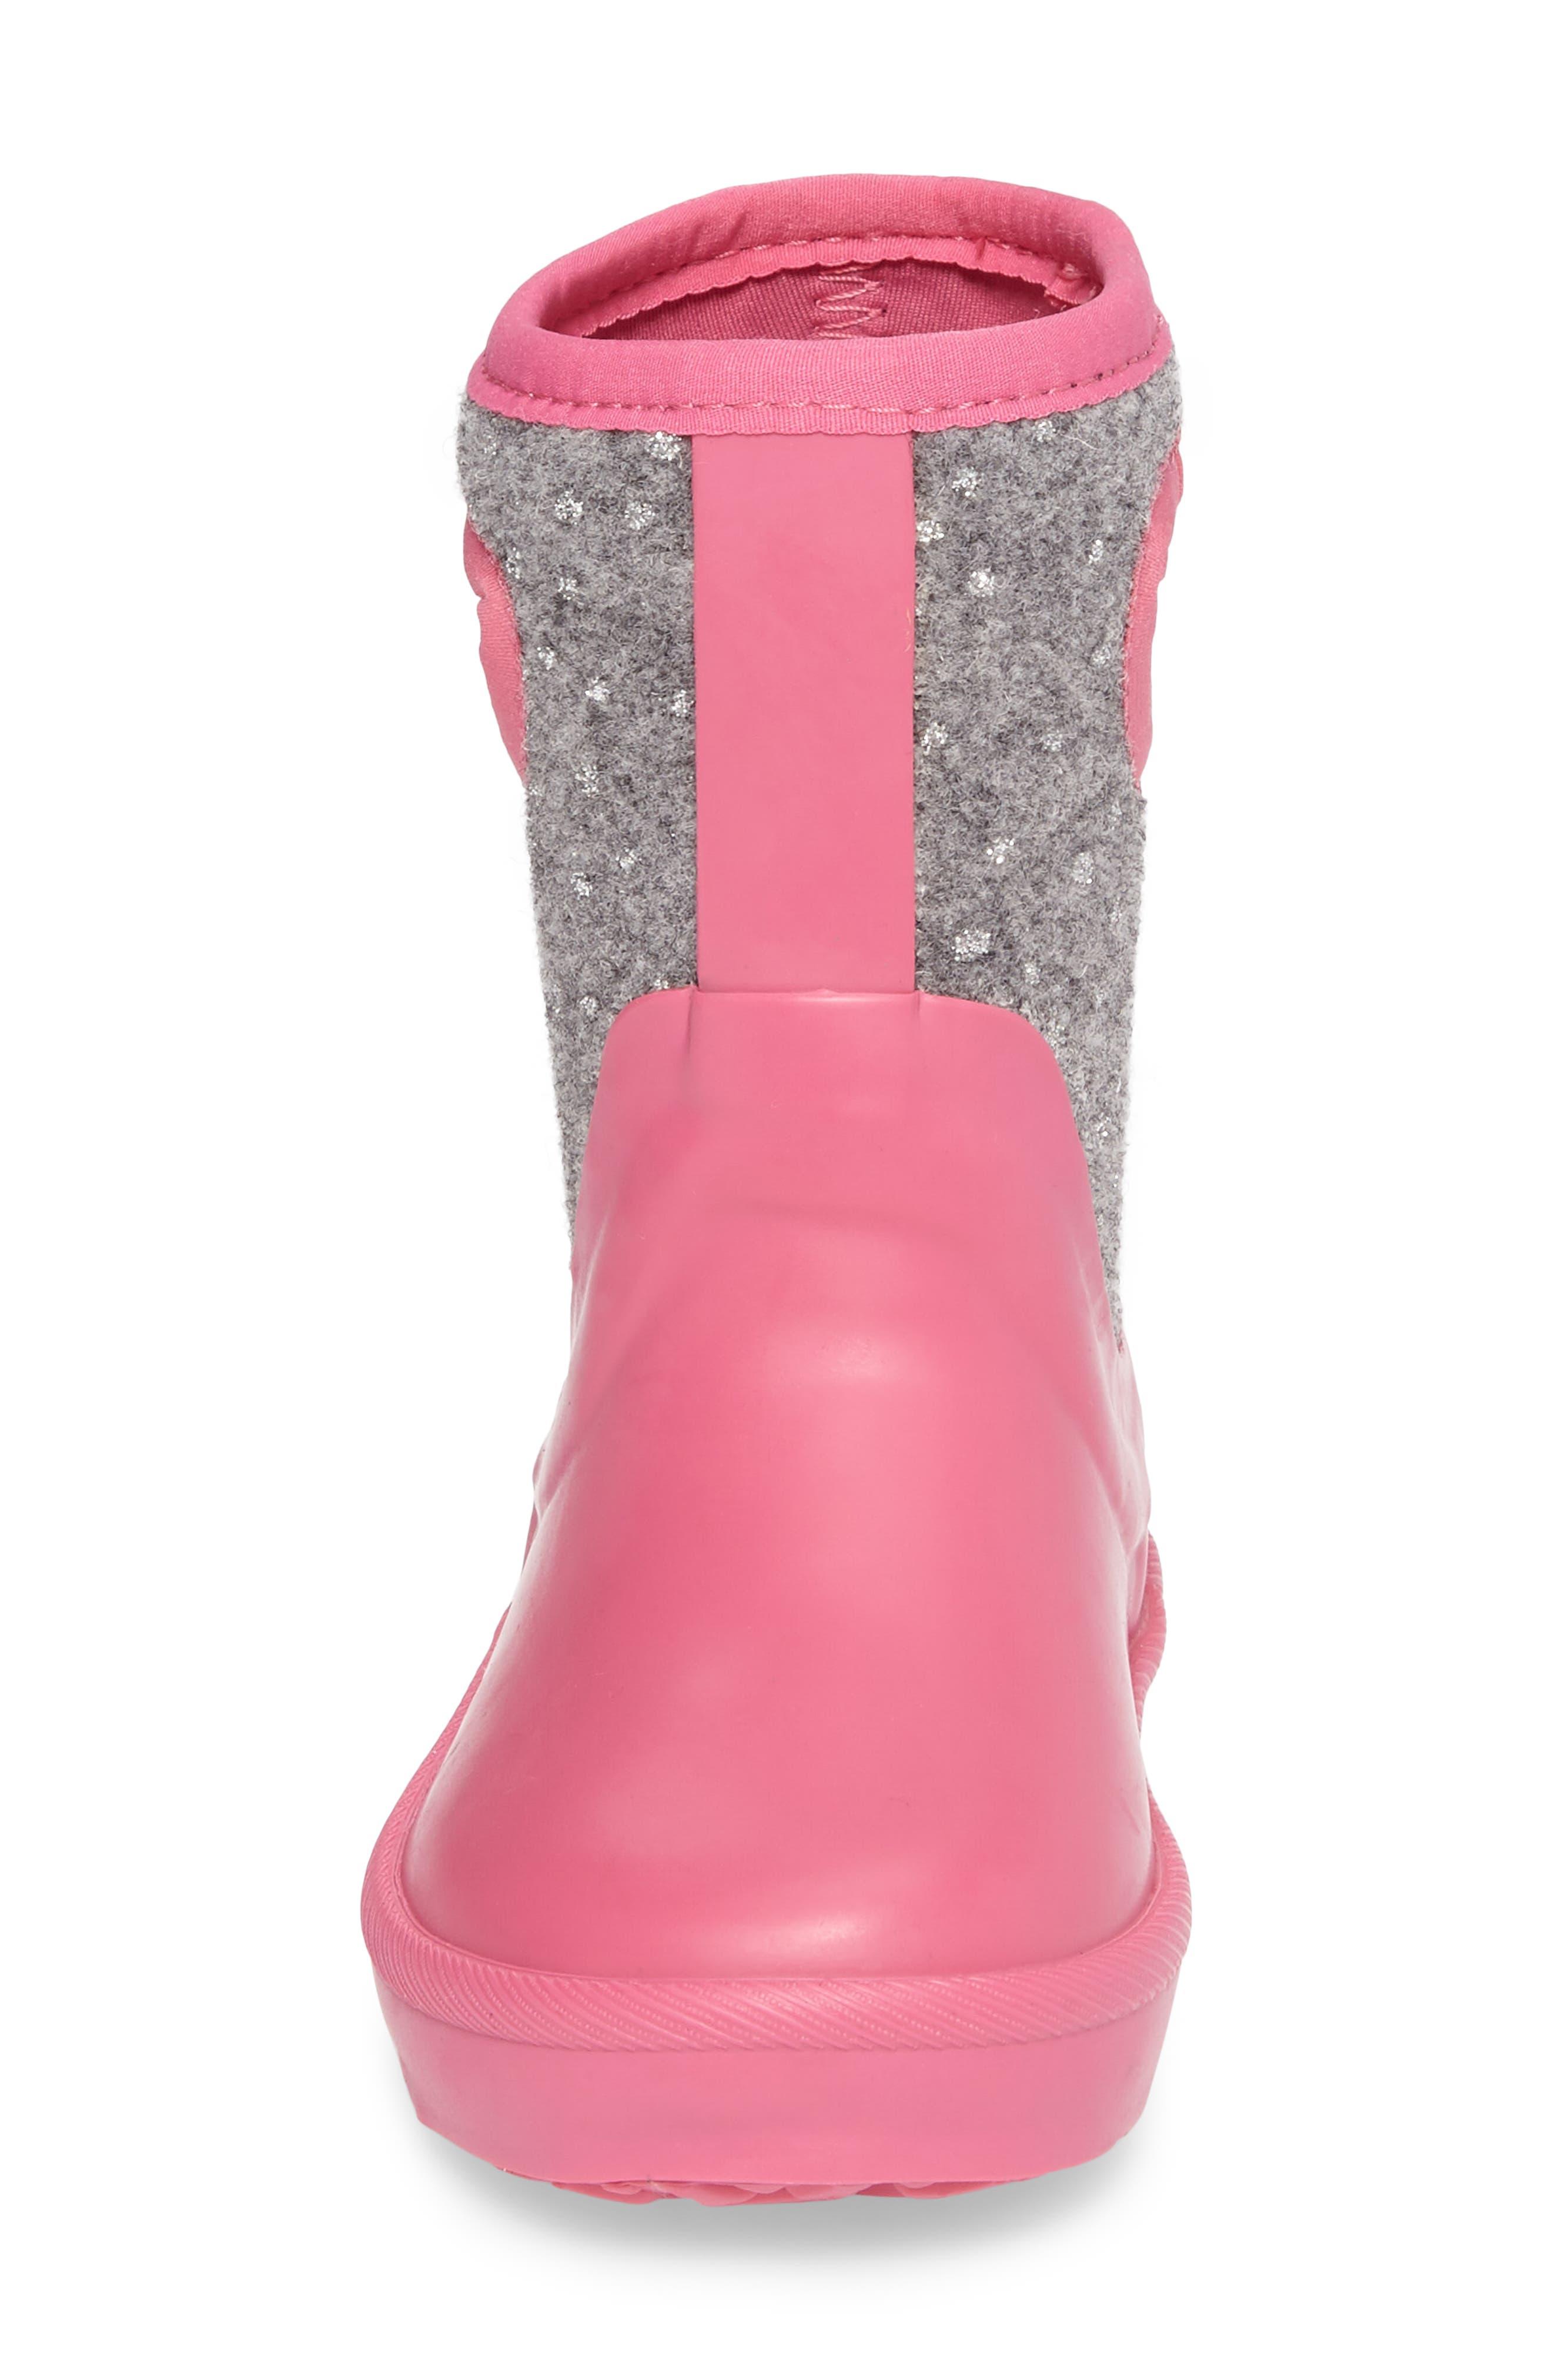 Kex Waterproof Boot,                             Alternate thumbnail 12, color,